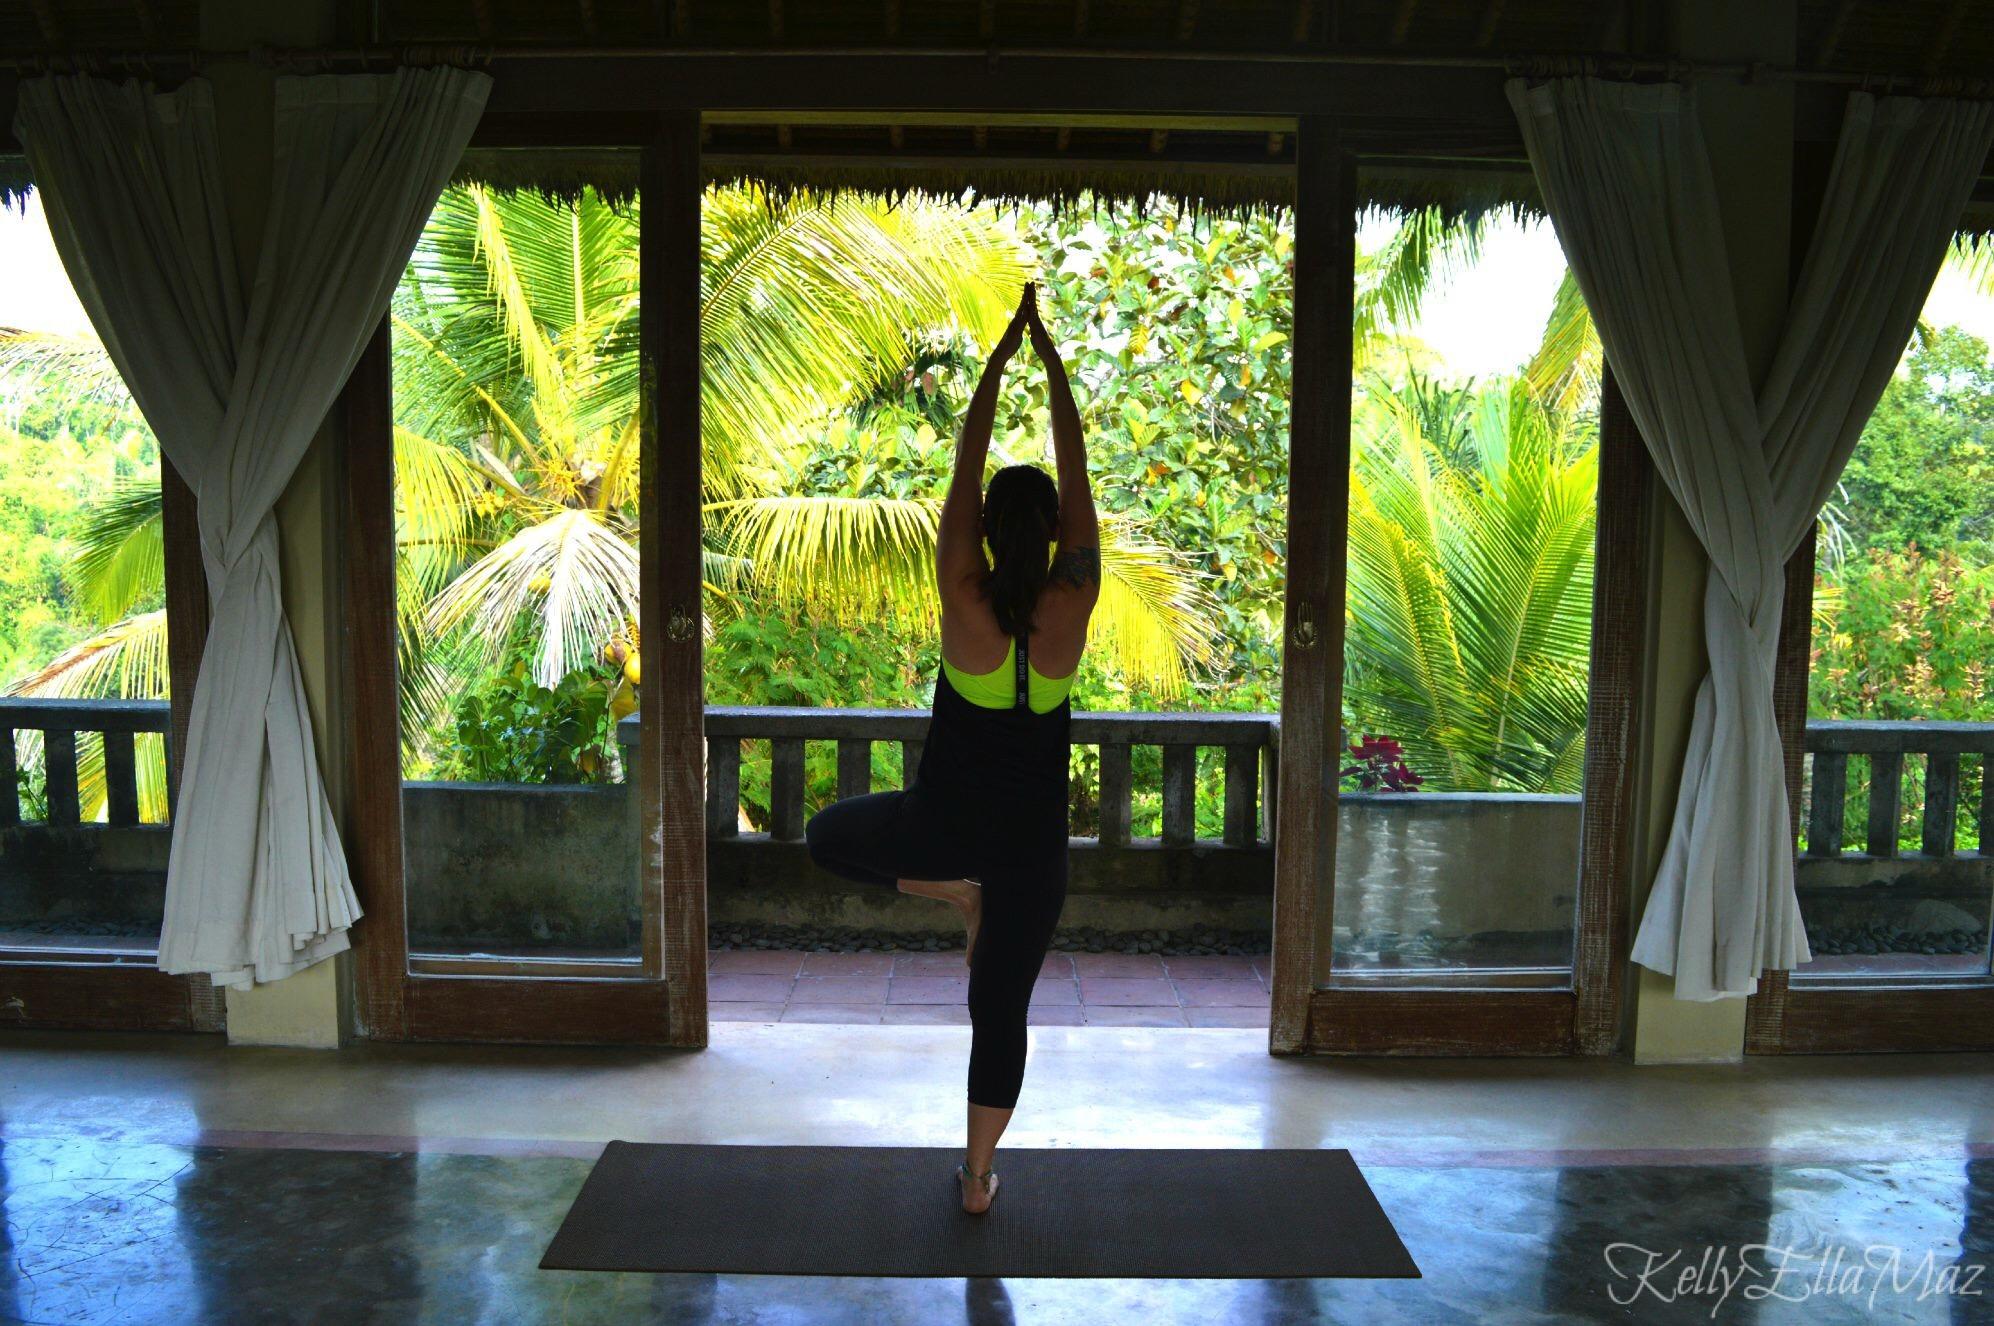 Kukhahnyoga\'s Blog – A Journey Into Yoga, Breathing, Wellness, and ...